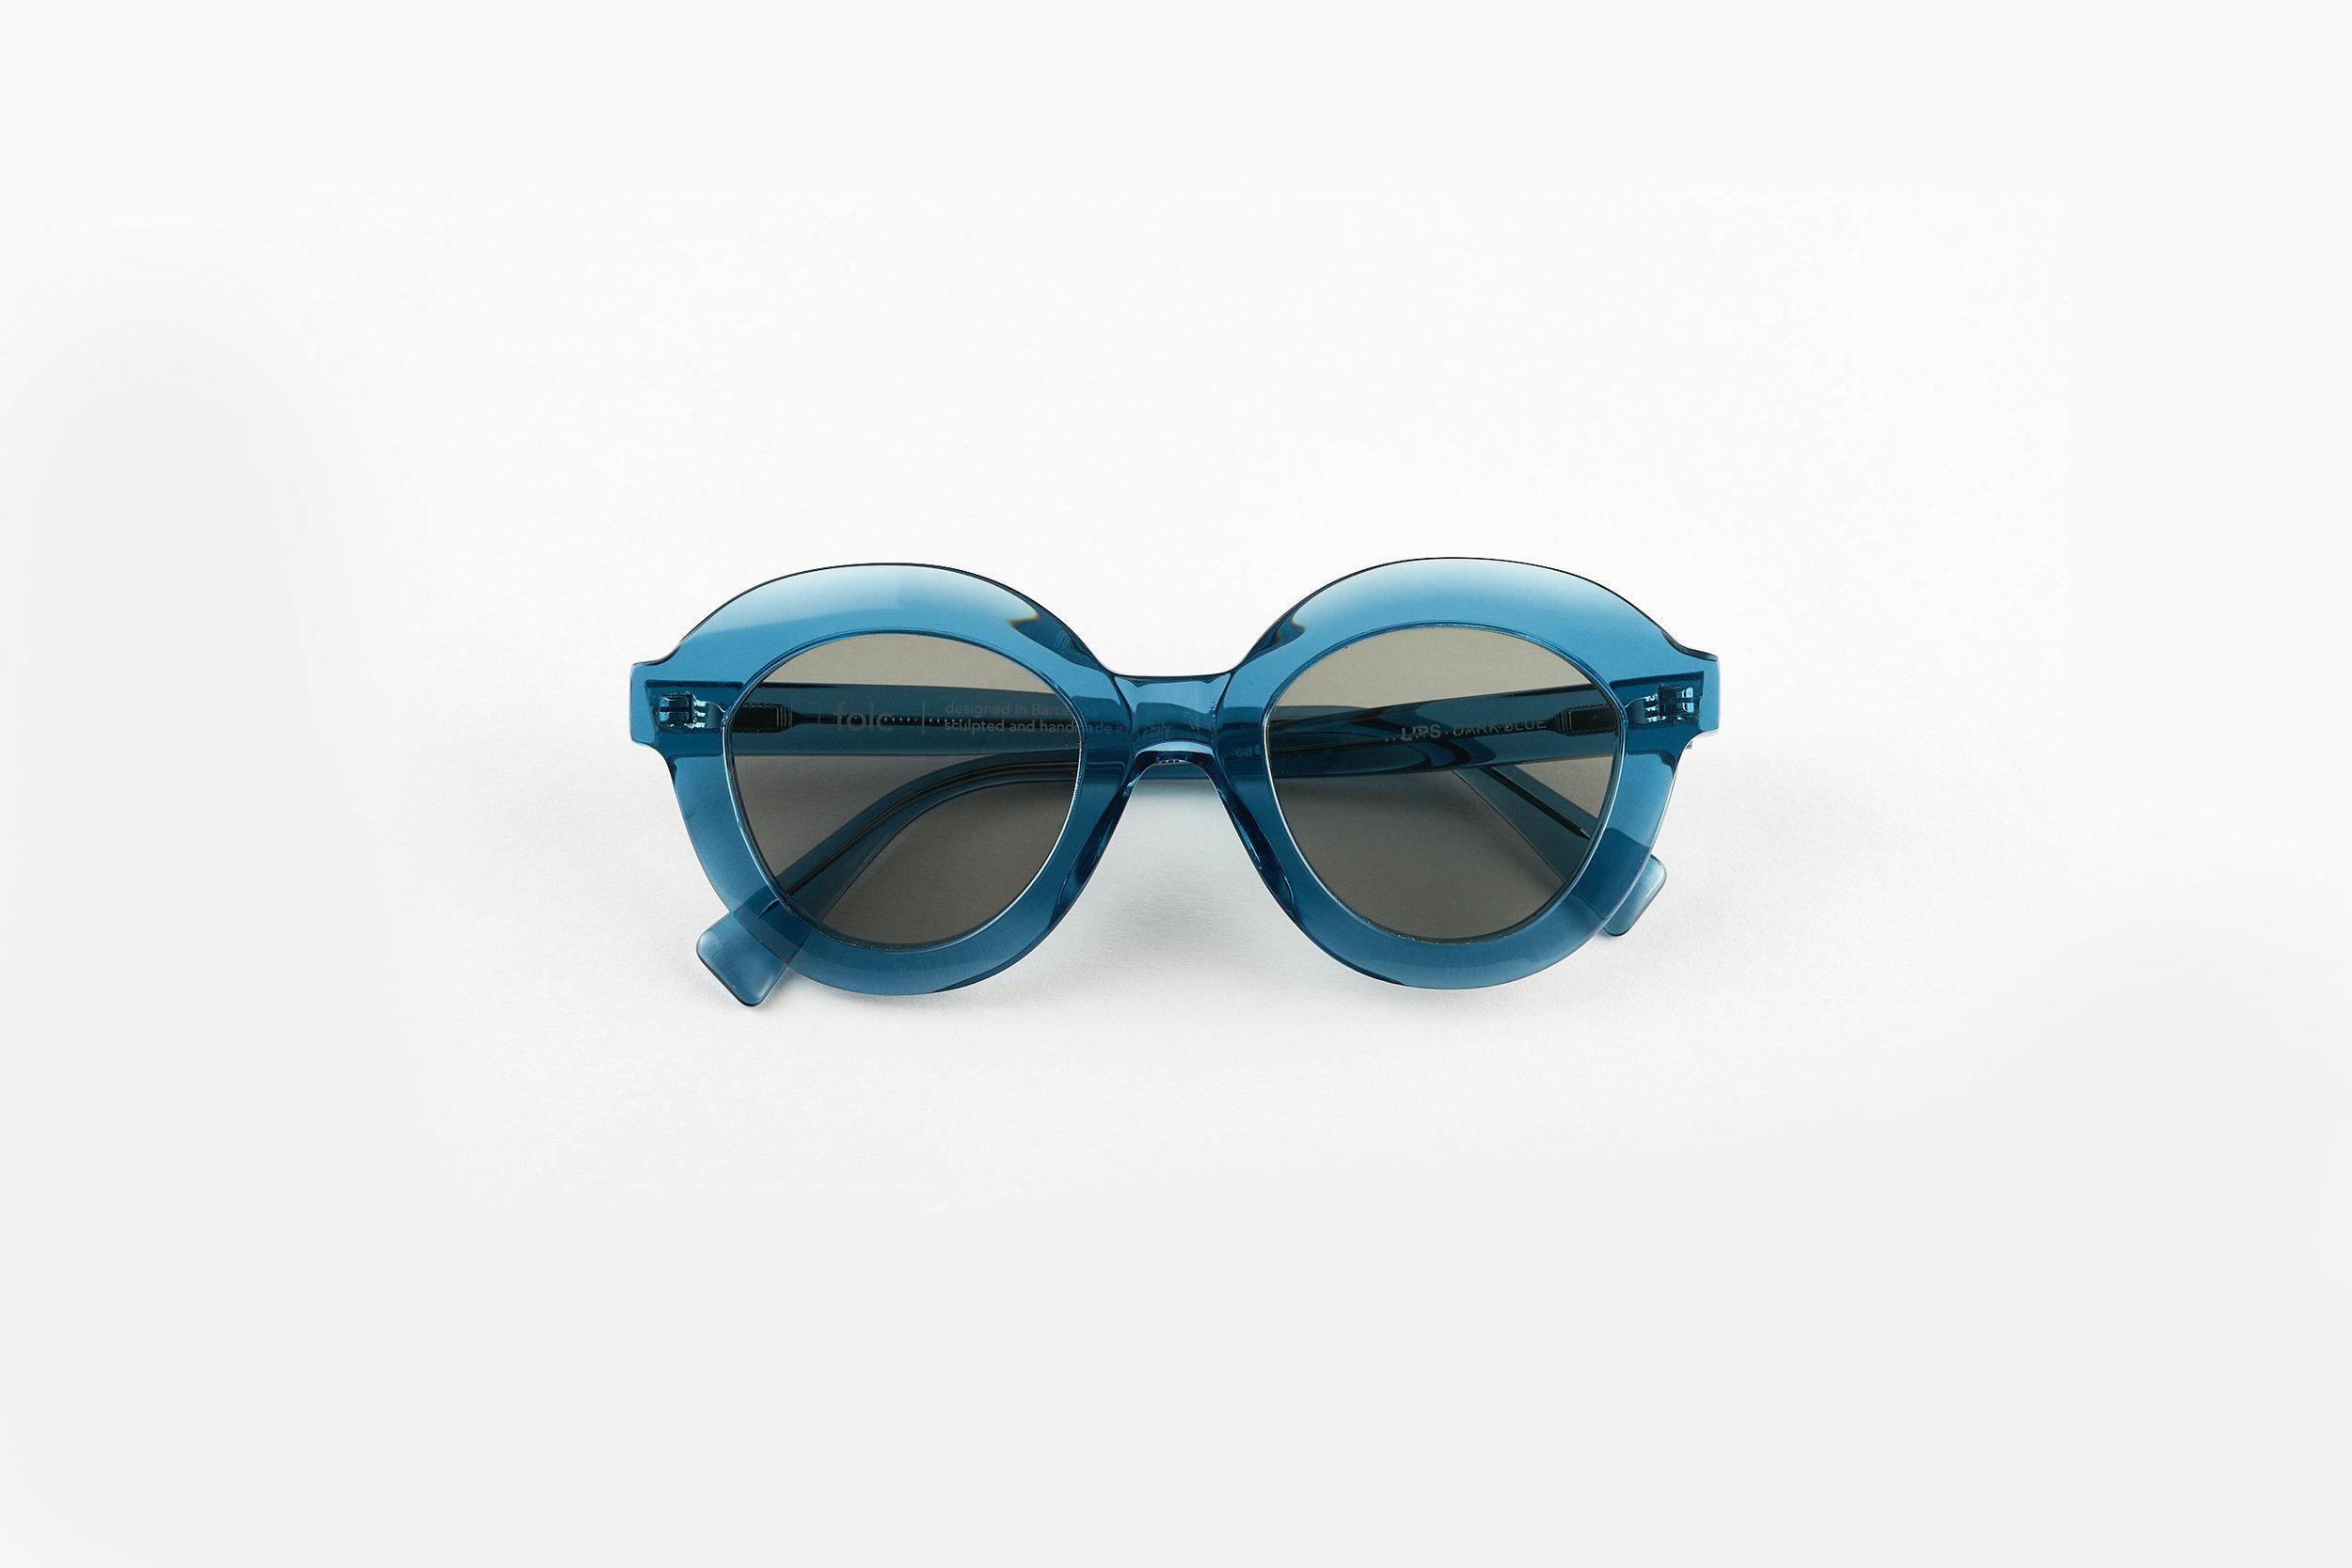 LIPS_DARK BLUE_FOLD-folc eyewear.jpg